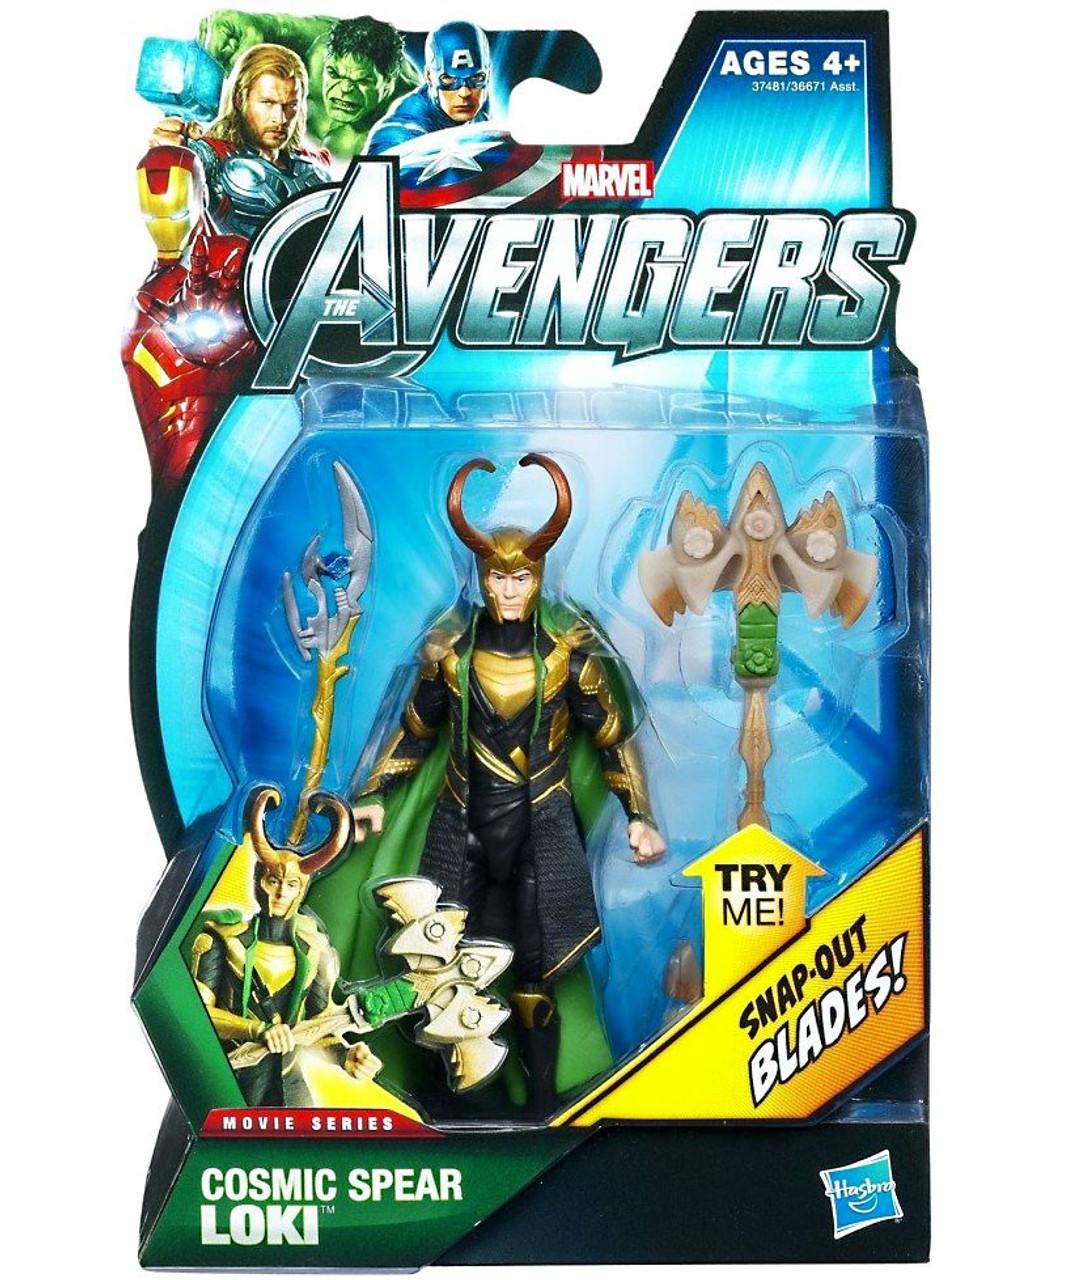 Marvel Avengers Movie Series Cosmic Spear Loki Action Figure